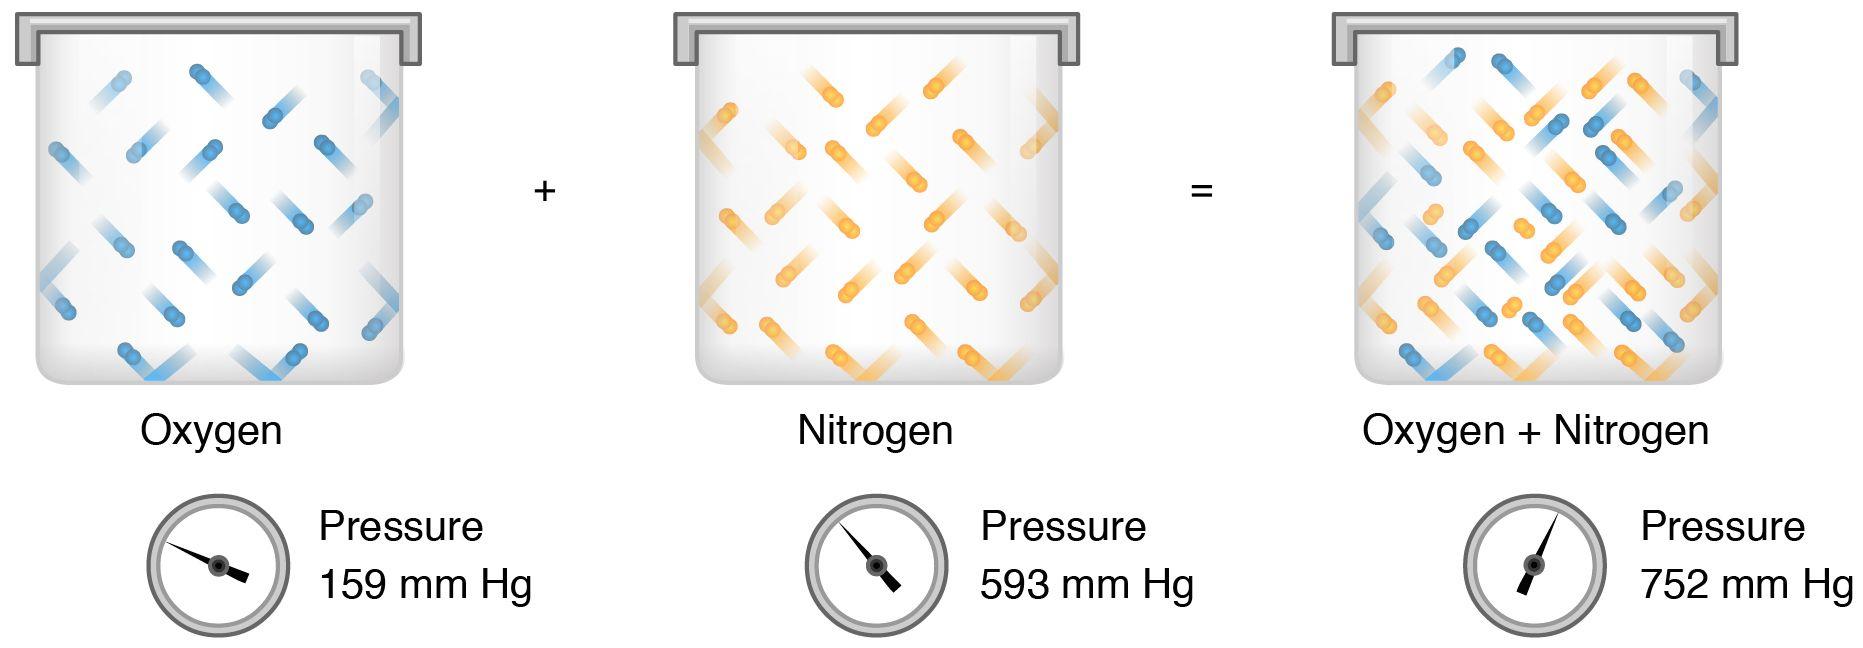 Dalton S Law Of Partial Pressure Ideal Gas Equation